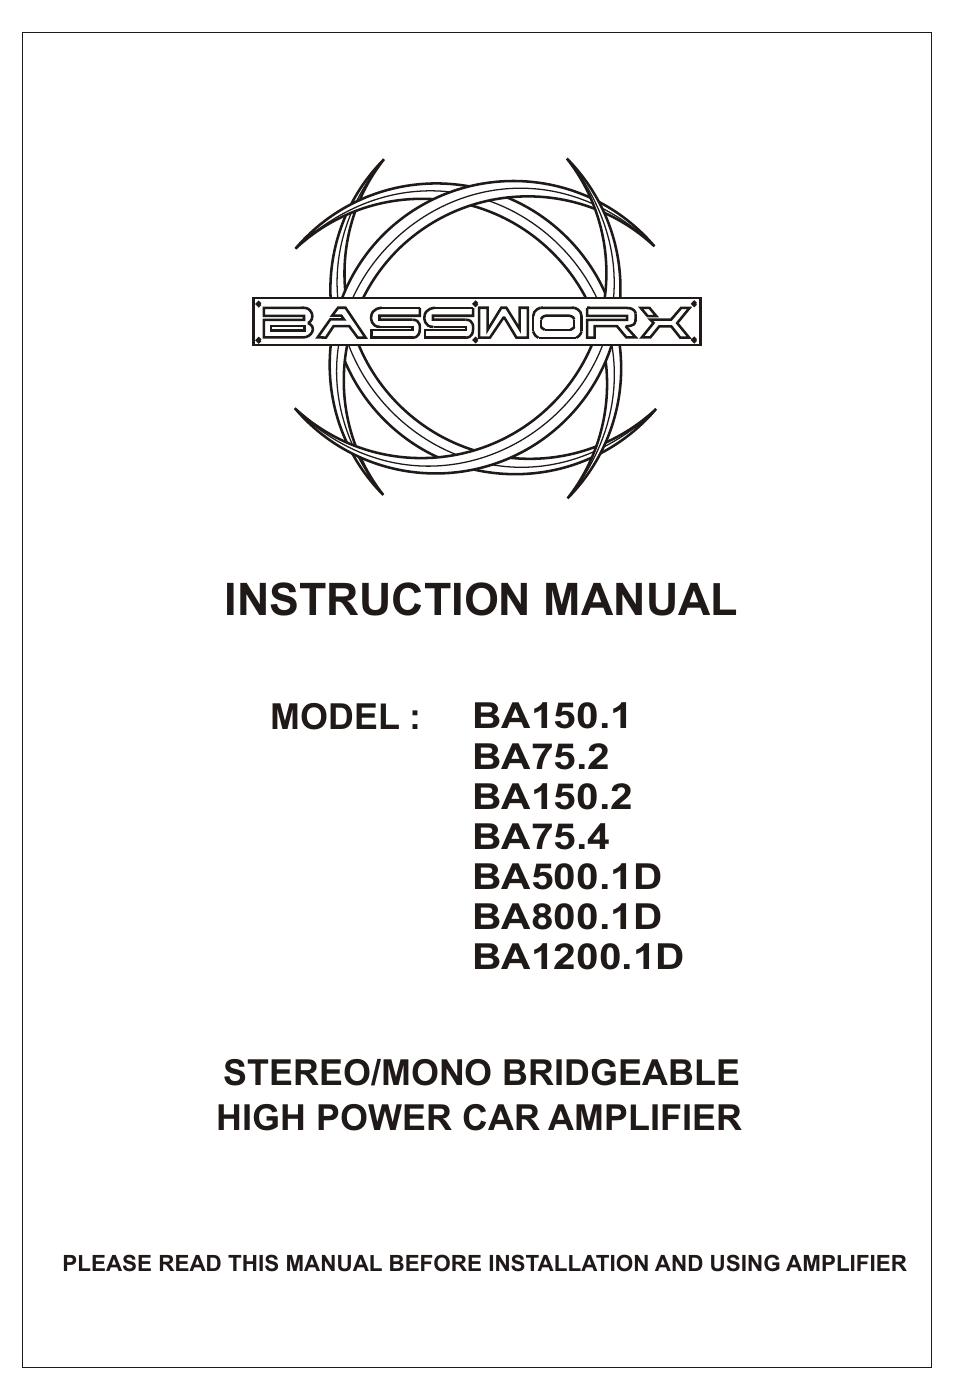 bassworx ba150 2 user manual 16 pages also for ba1200 1d ba75 rh manualsdir com Instruction Manual Book User Manual Icon